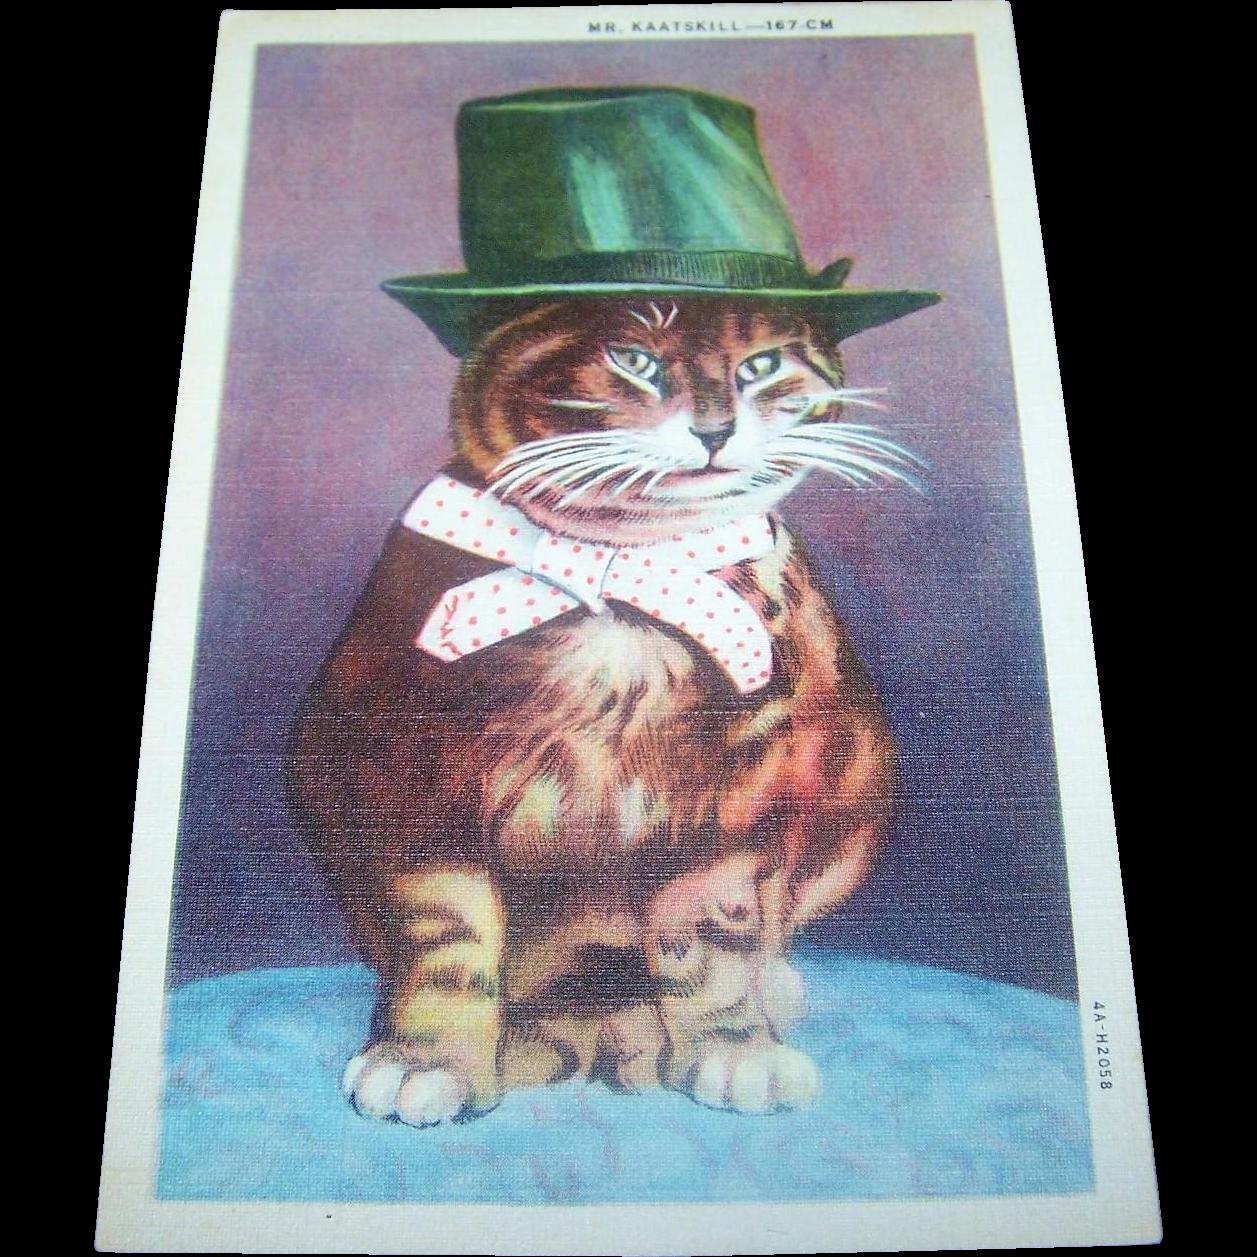 Vintage Historical Kitty Cat Post Card Mr. KAATSKILL - 167 CM